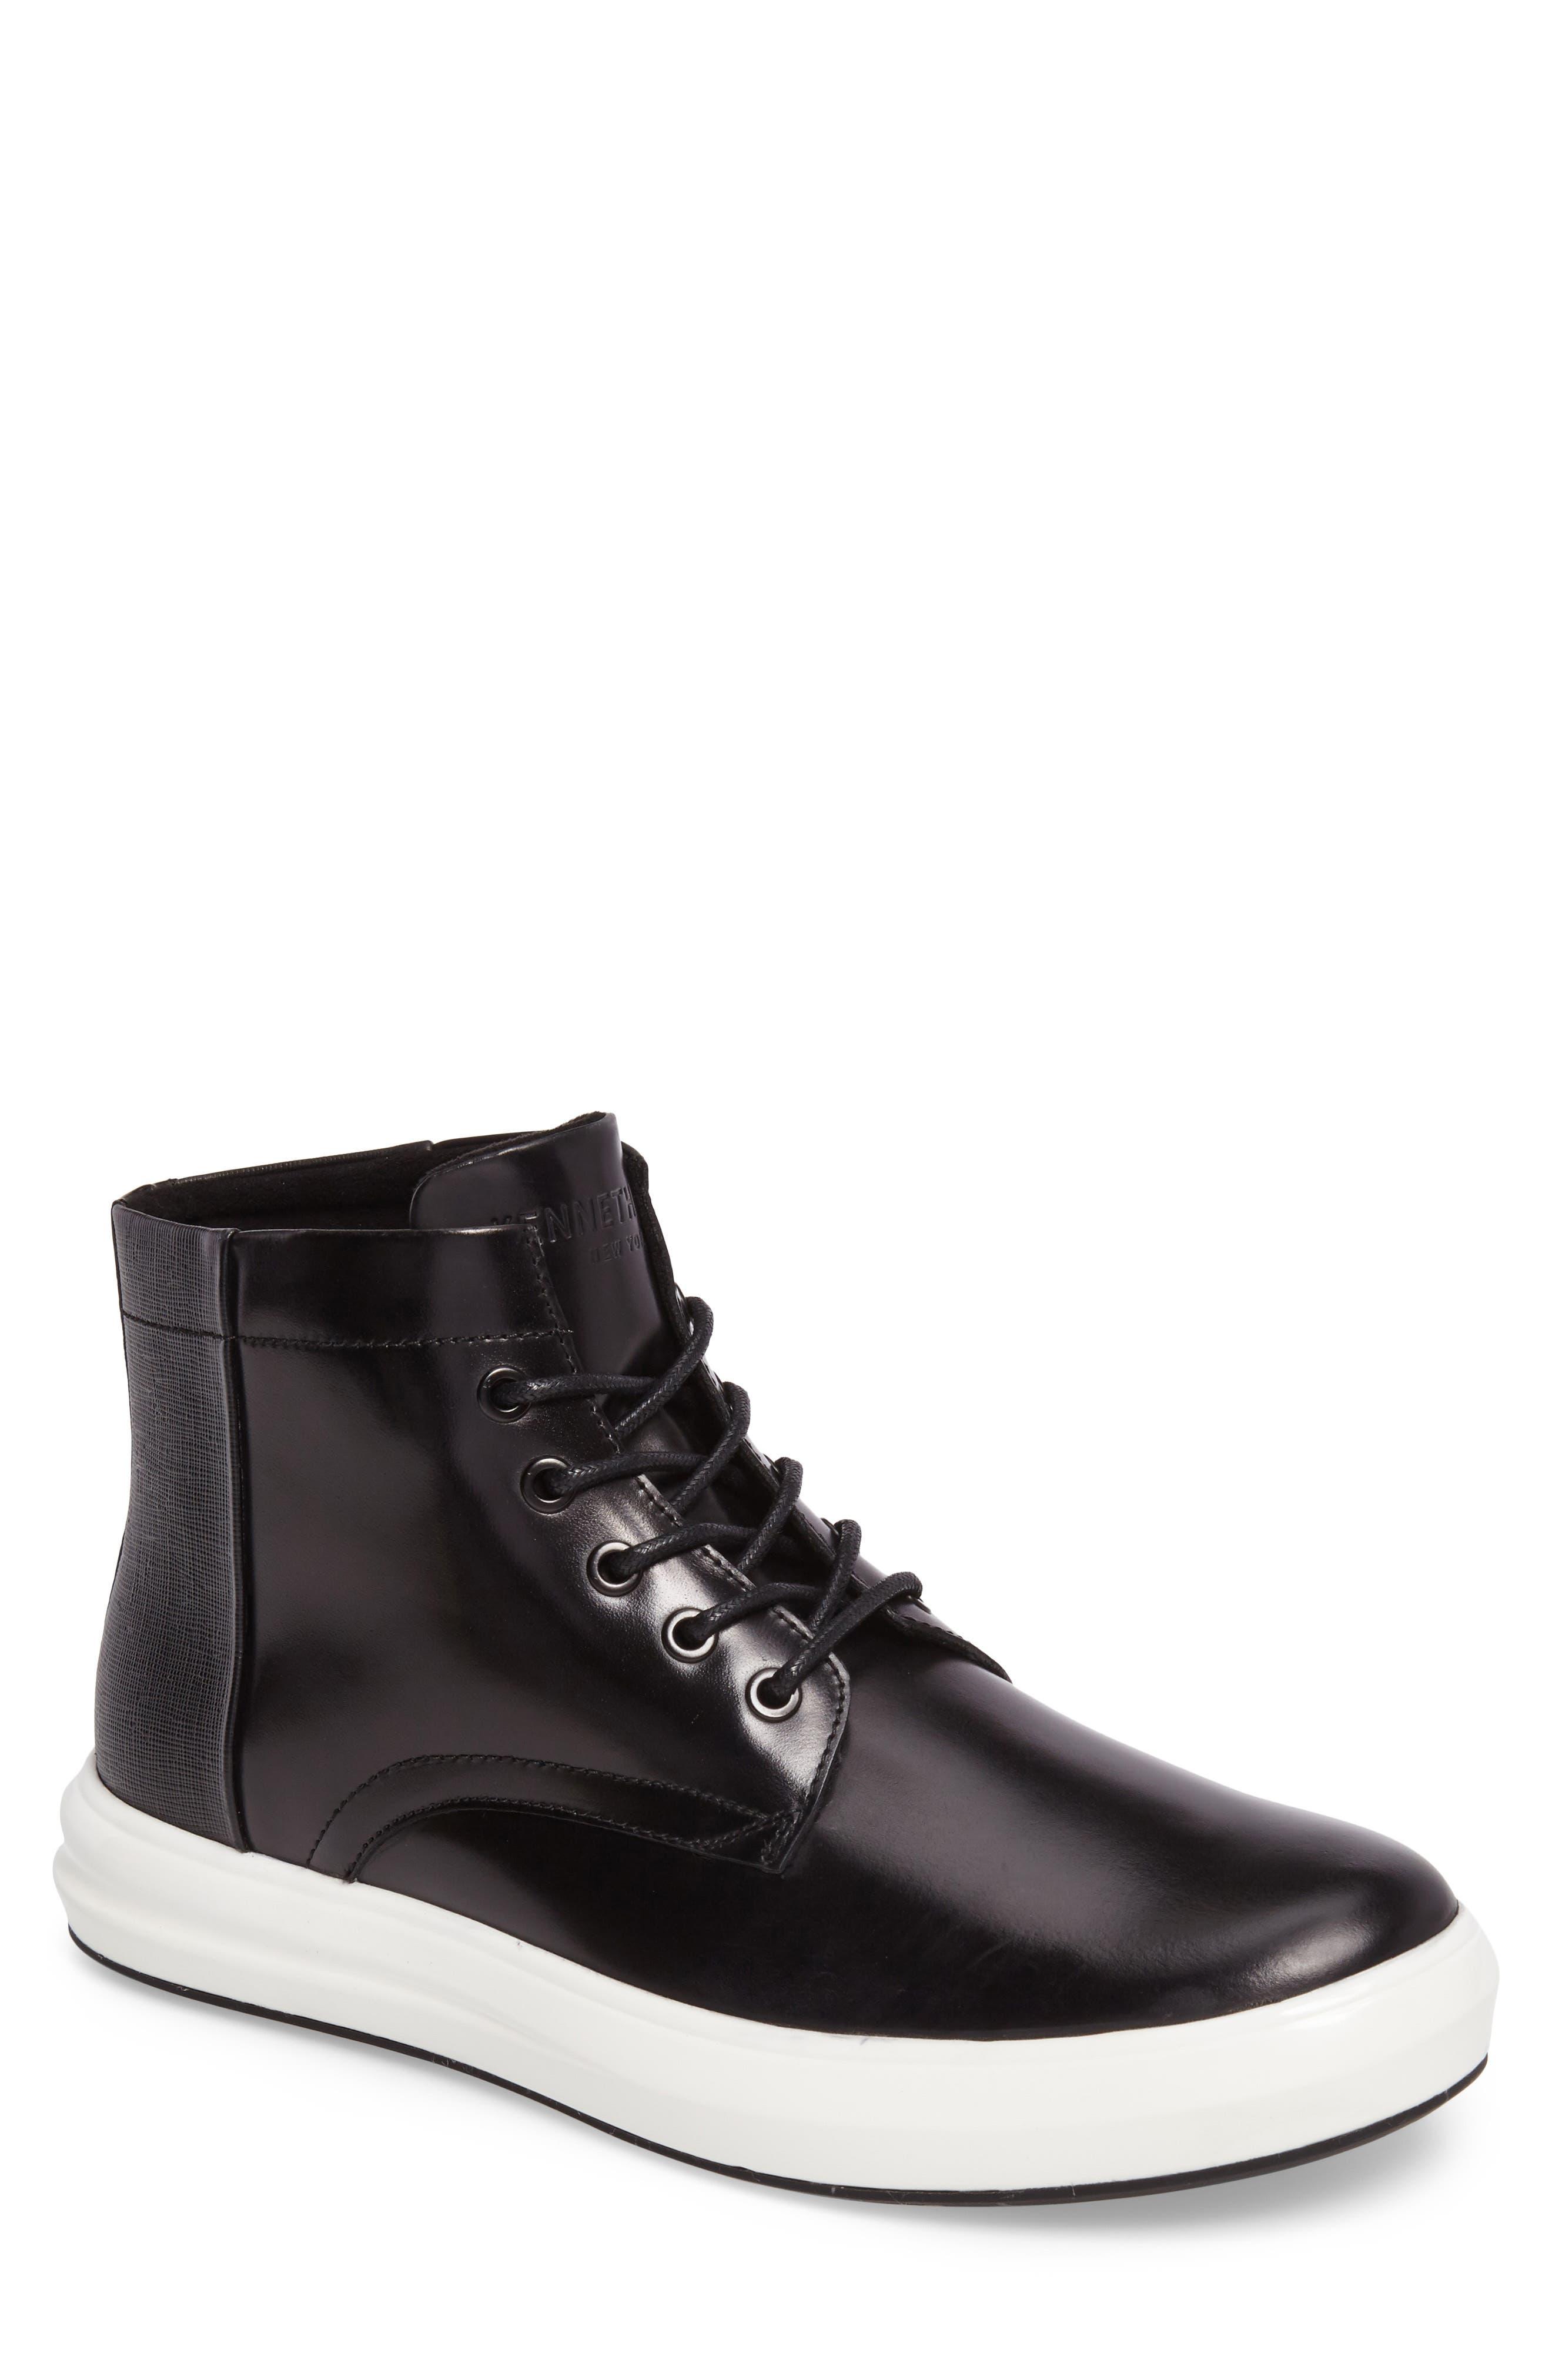 Kenneth Cole New York High Top Sneaker (Men)